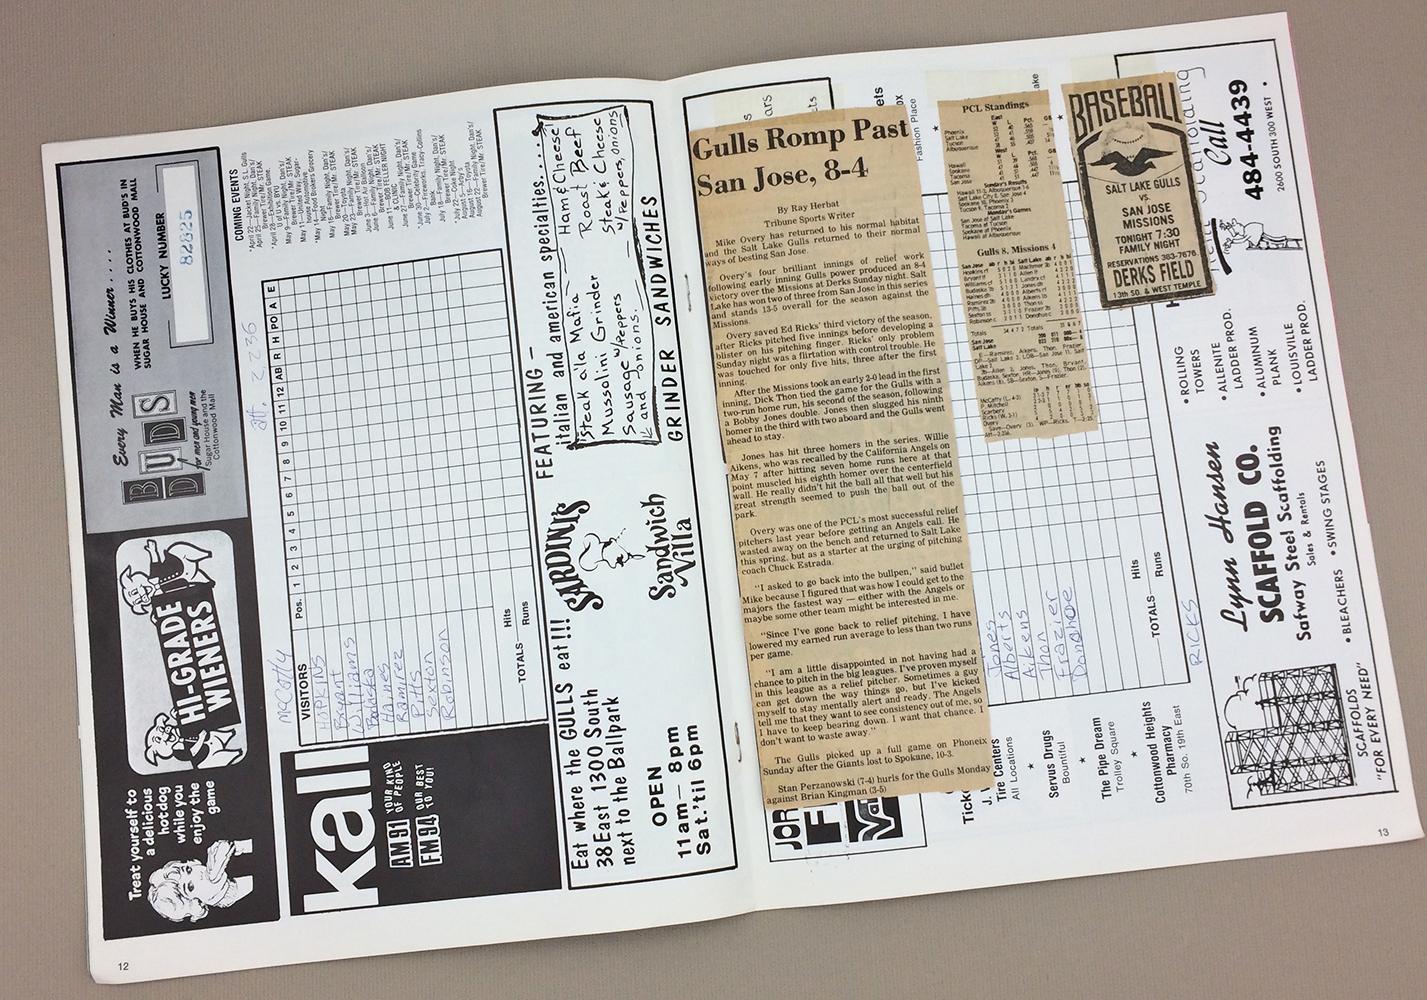 1977 Salk Lake Gulls Game Program